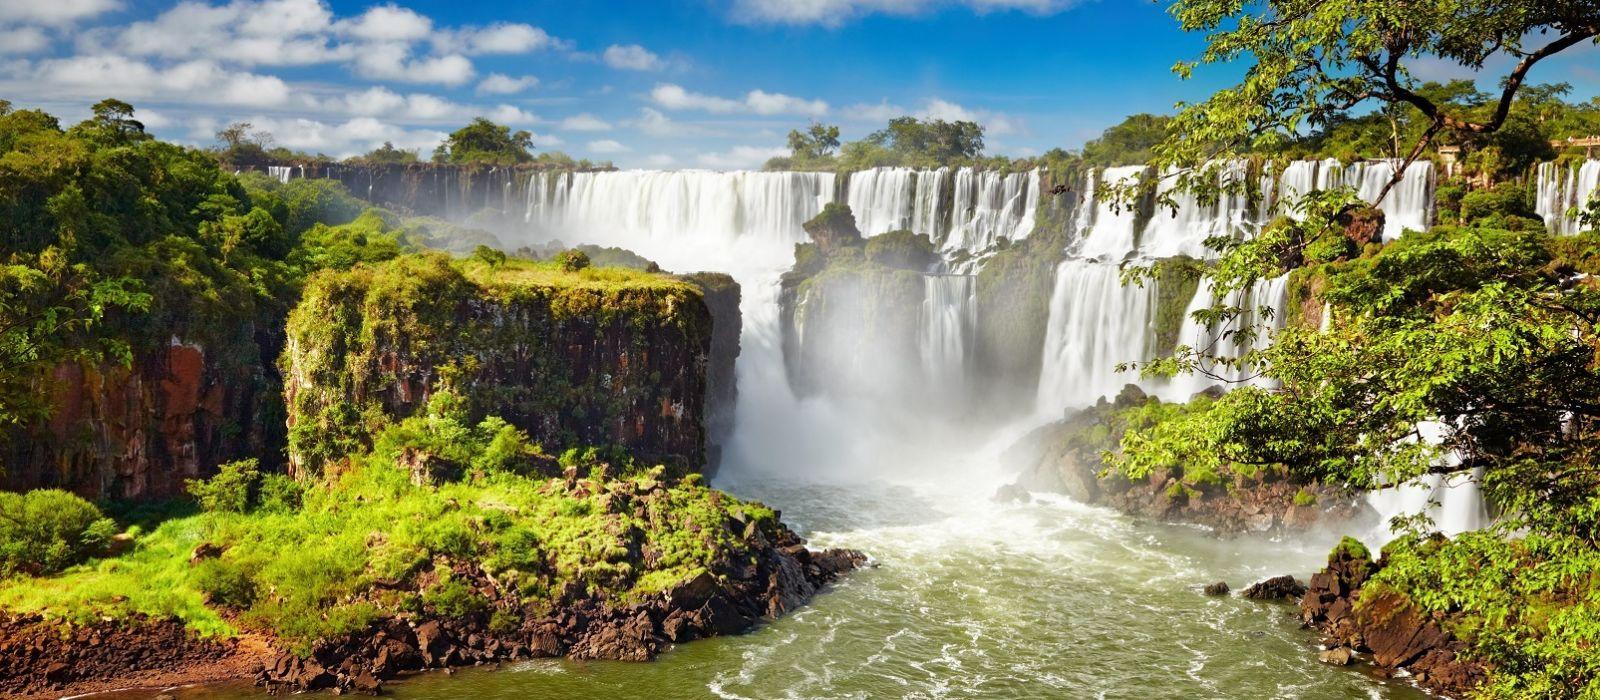 Glaciers, Wildlife & Waterfalls in Argentina Tour Trip 2